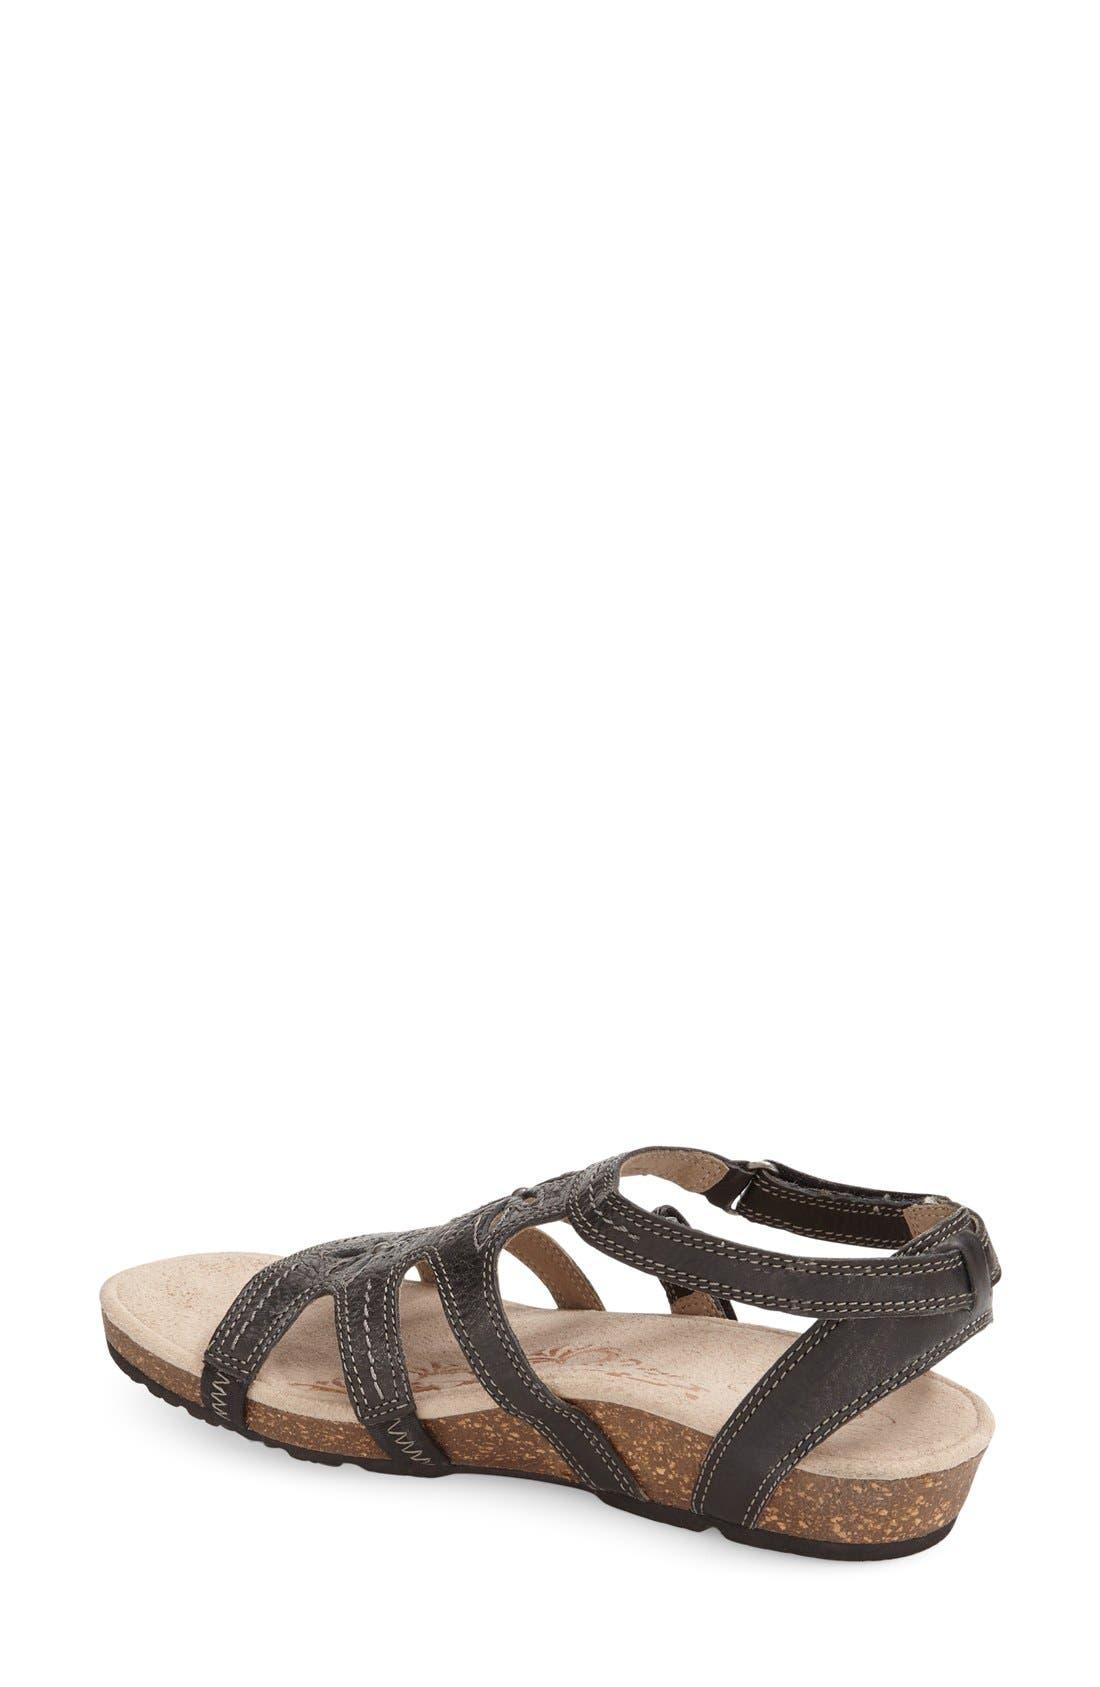 'Natasha' Gladiator Sandal,                             Alternate thumbnail 2, color,                             Black Leather